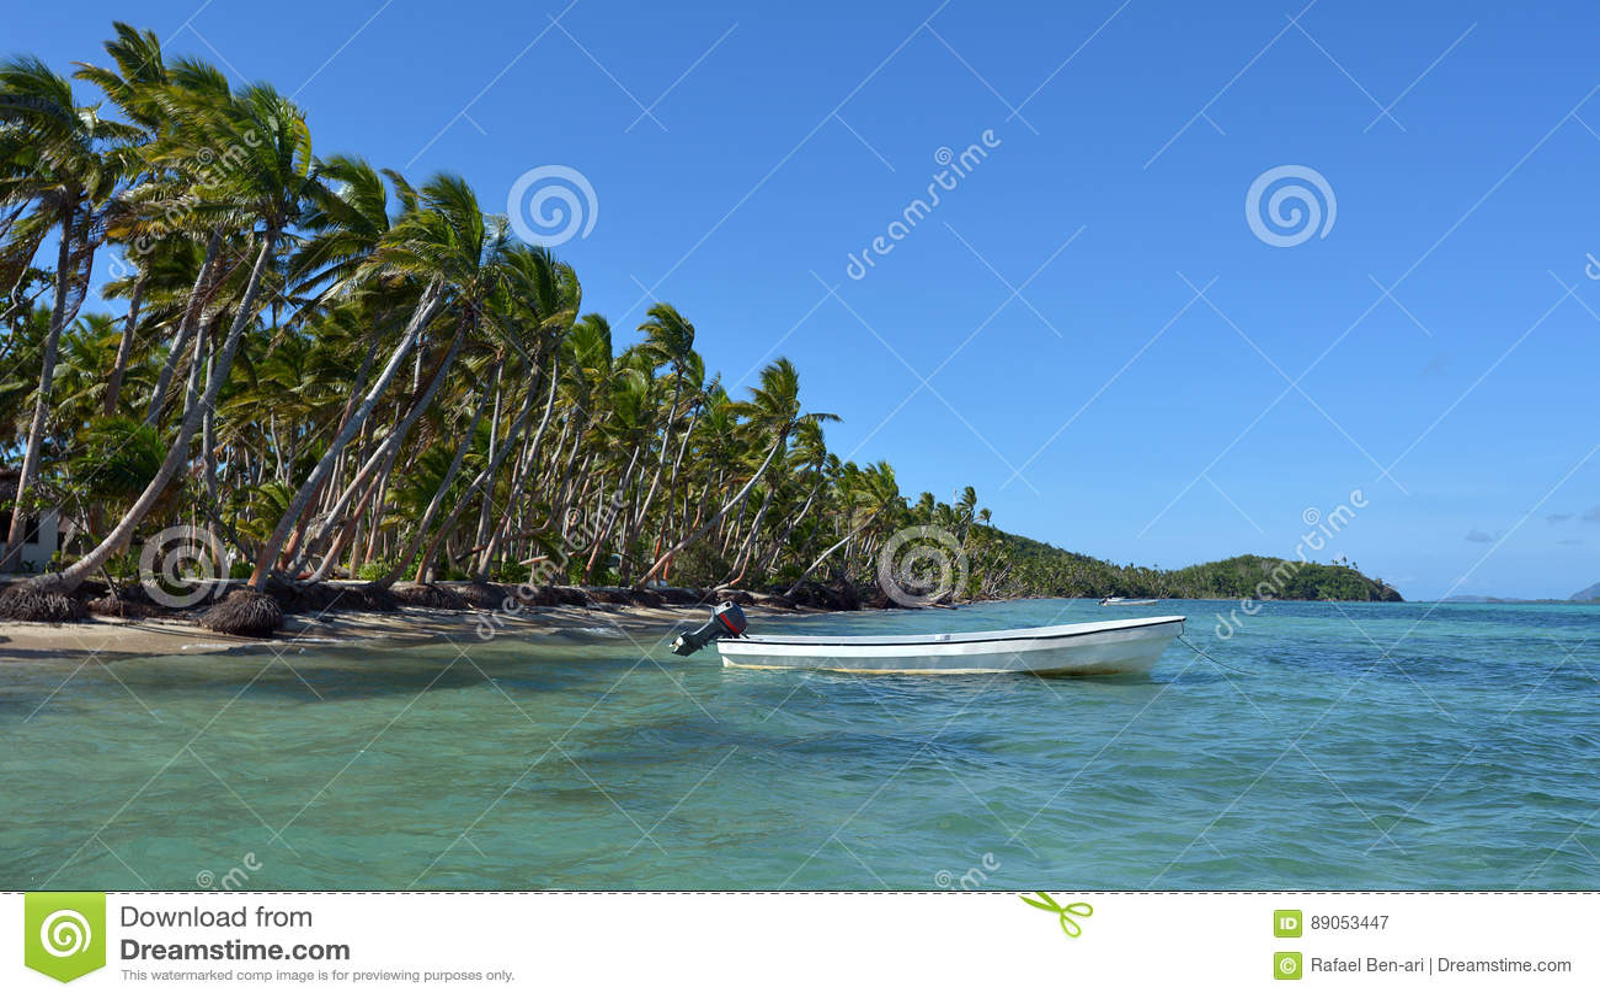 White Fishing Boat On A Tropical Island In Fiji